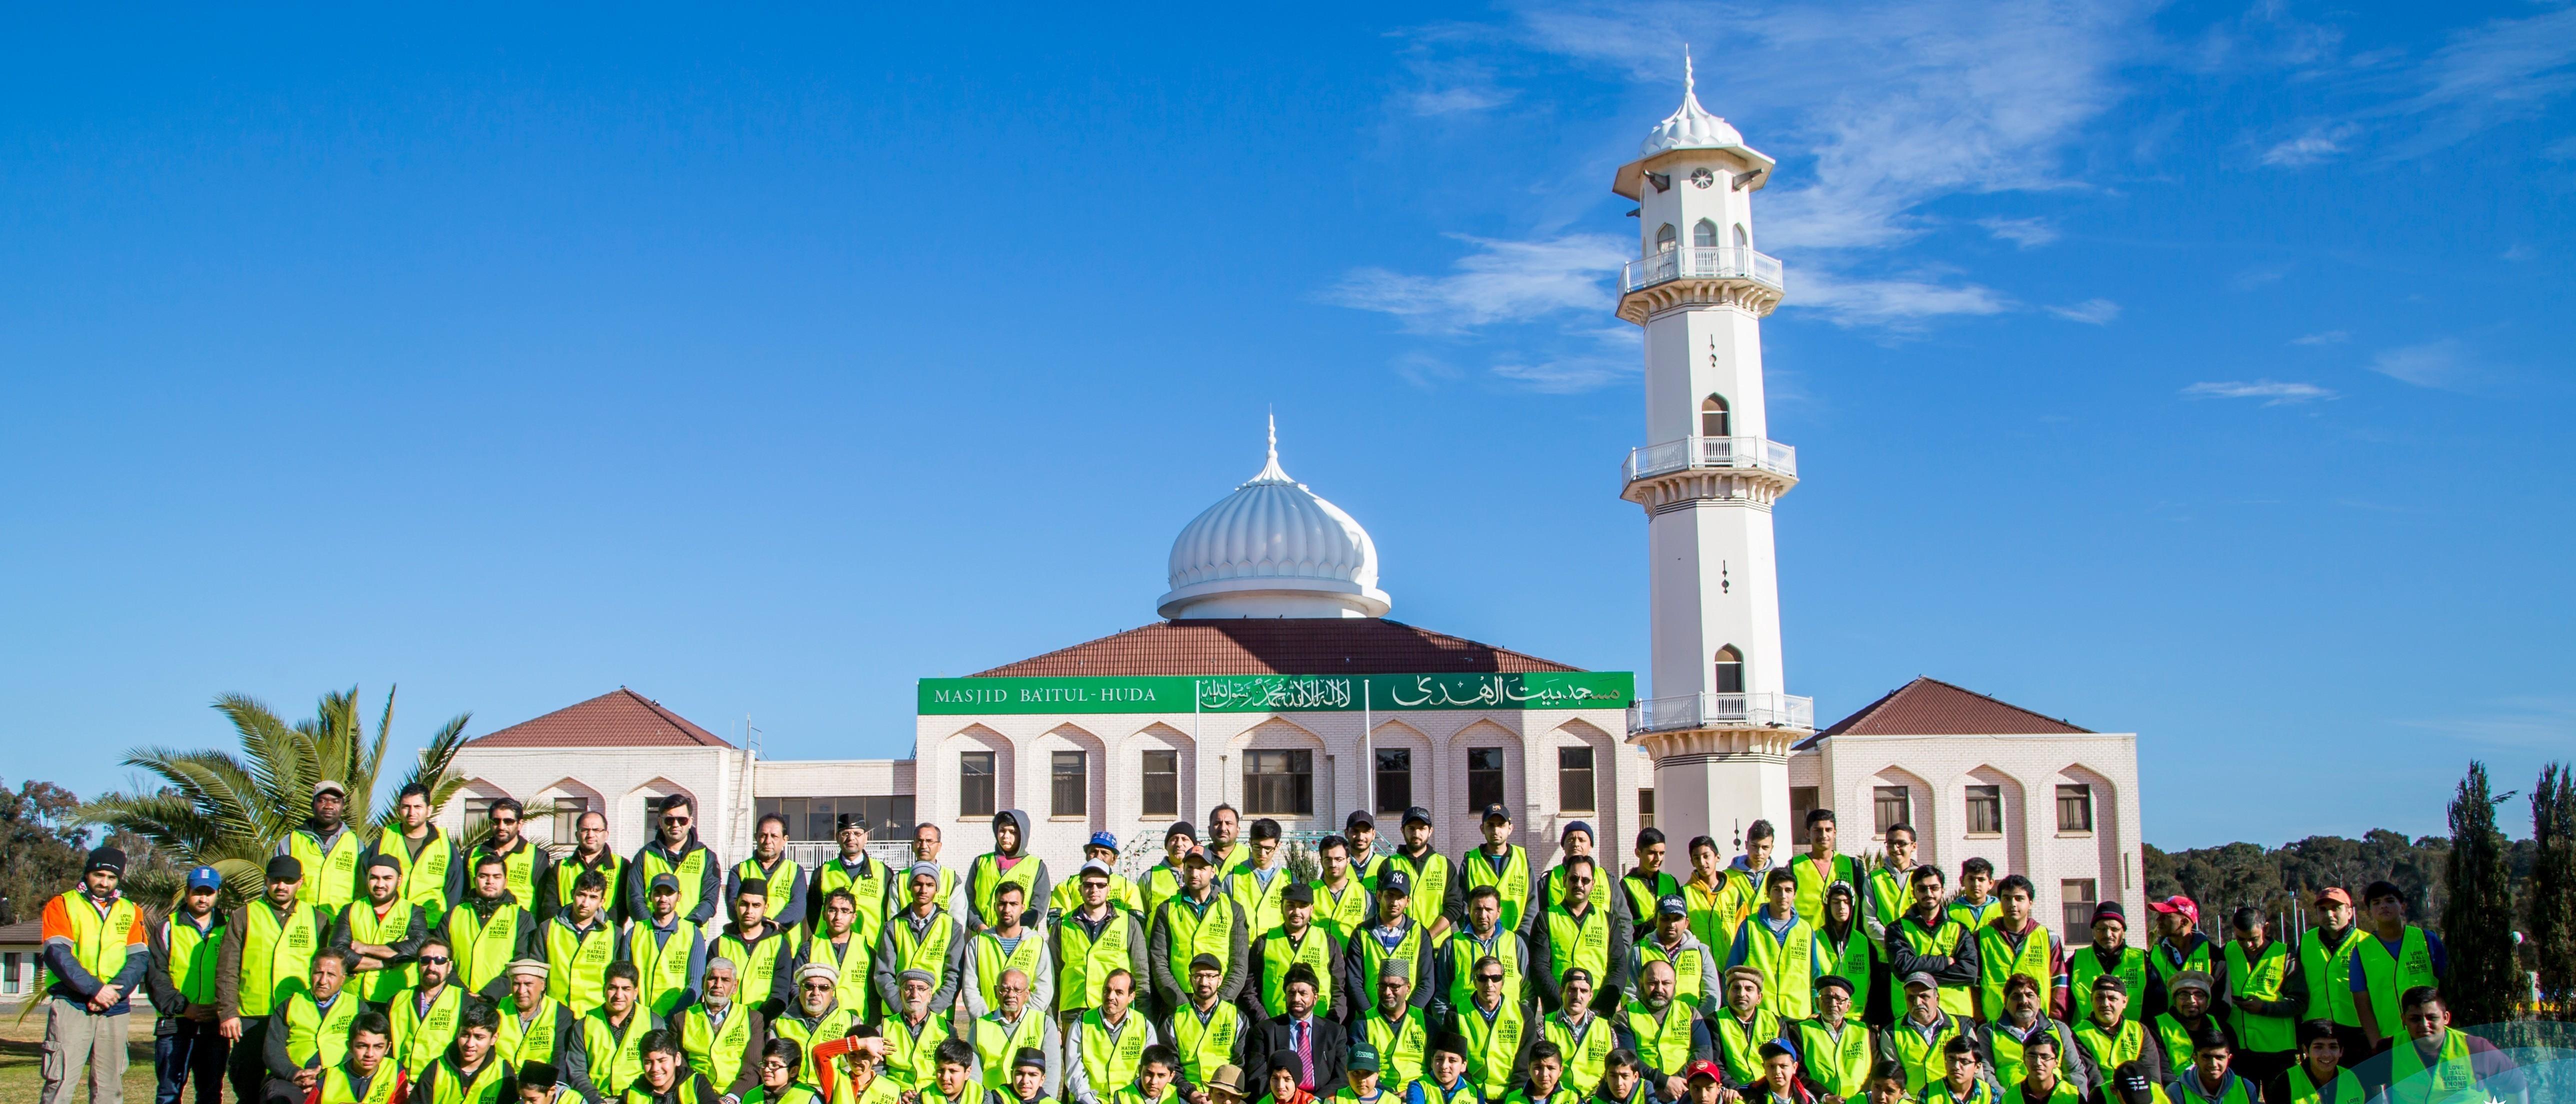 Ahmadi Muslims QLD - Bait-ul-Masroor Mosque (Ladies)